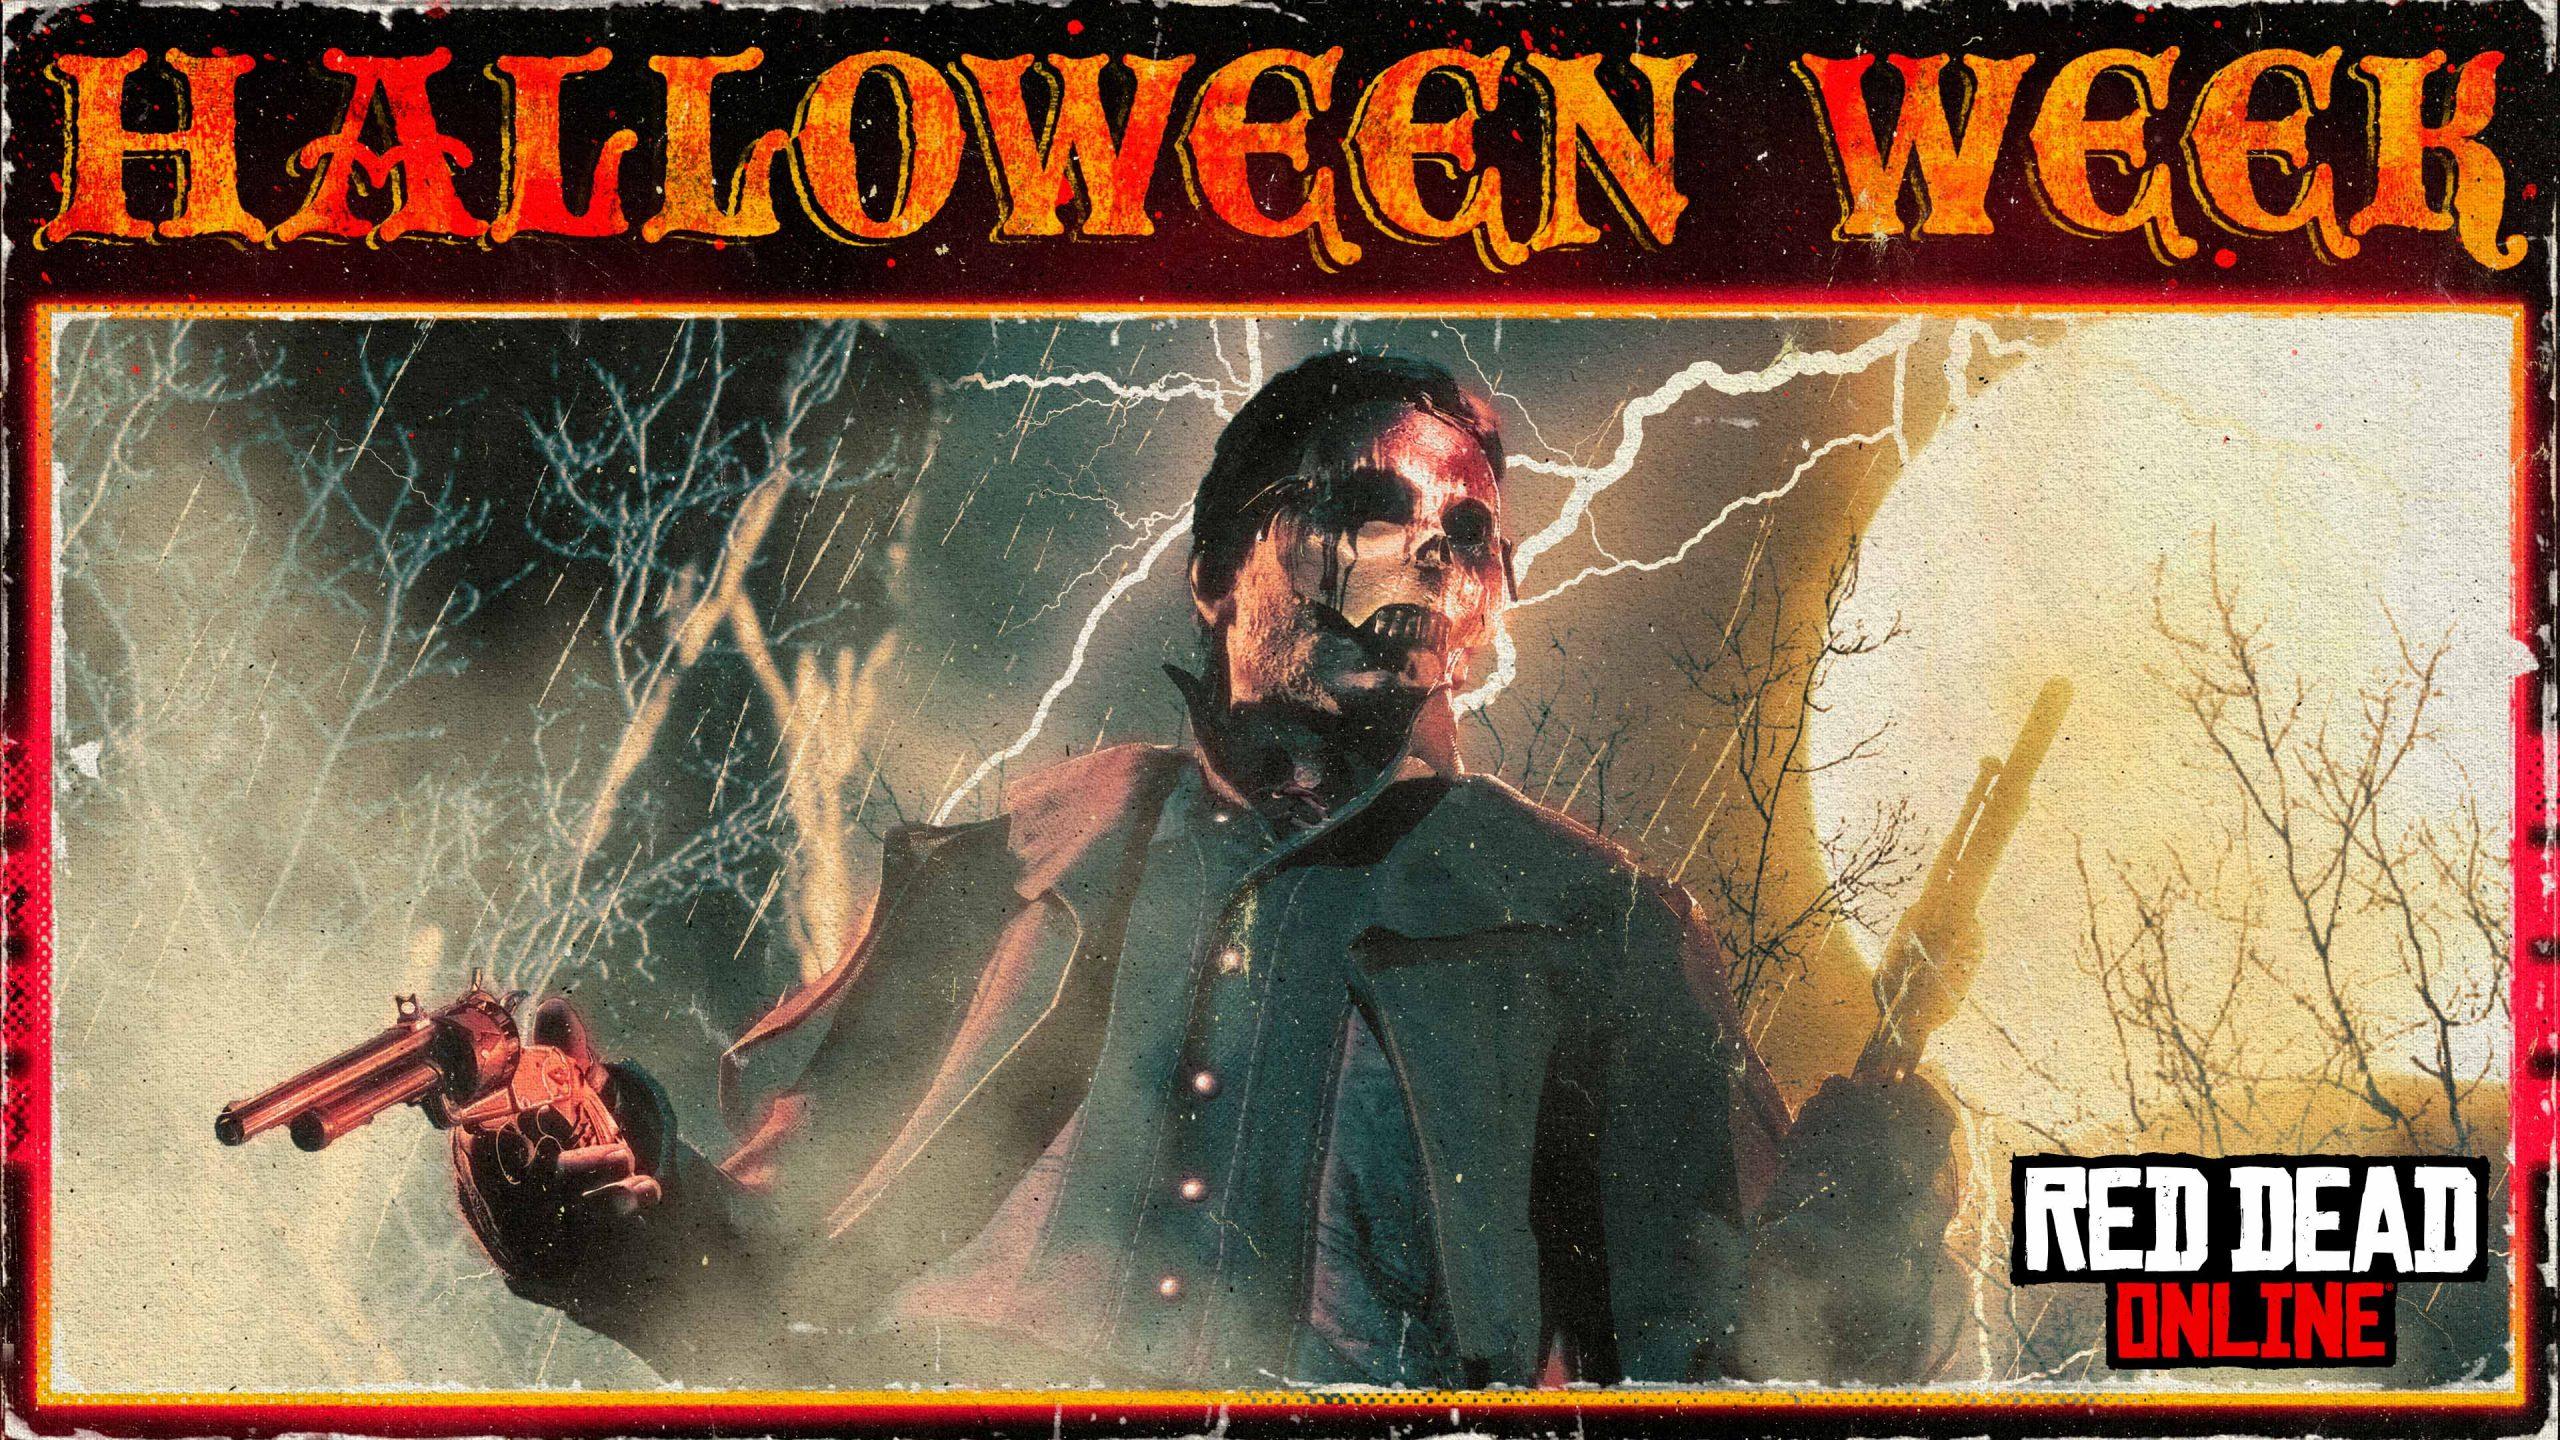 Red Dead Online et sa semaine d'Halloween (bannière du Rockstar Newswire)